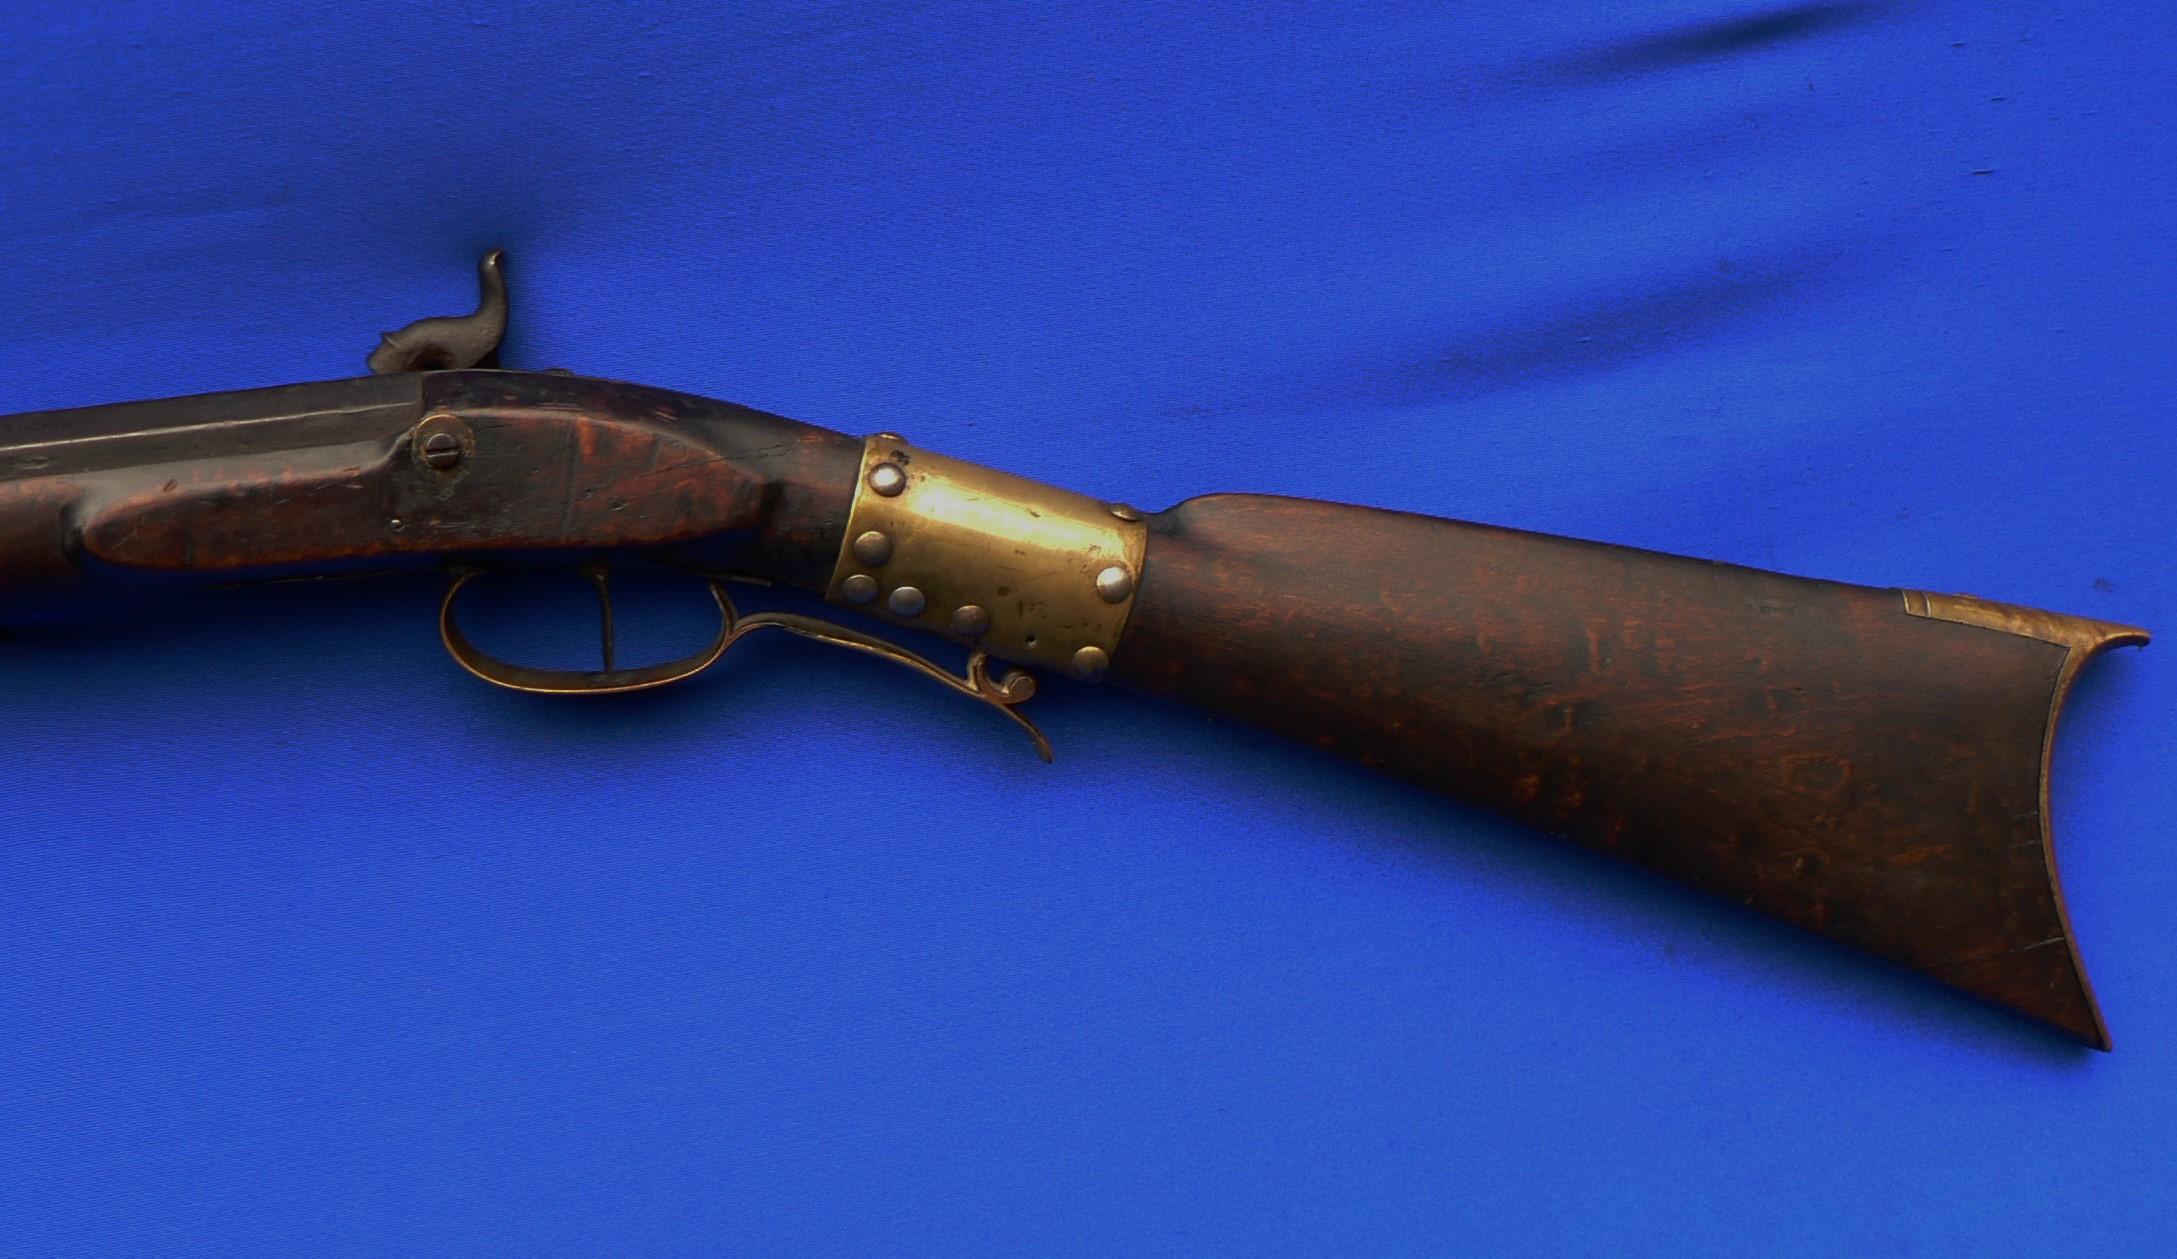 John Fleeger, smooth rifle, 1840-1850 – Recreating History